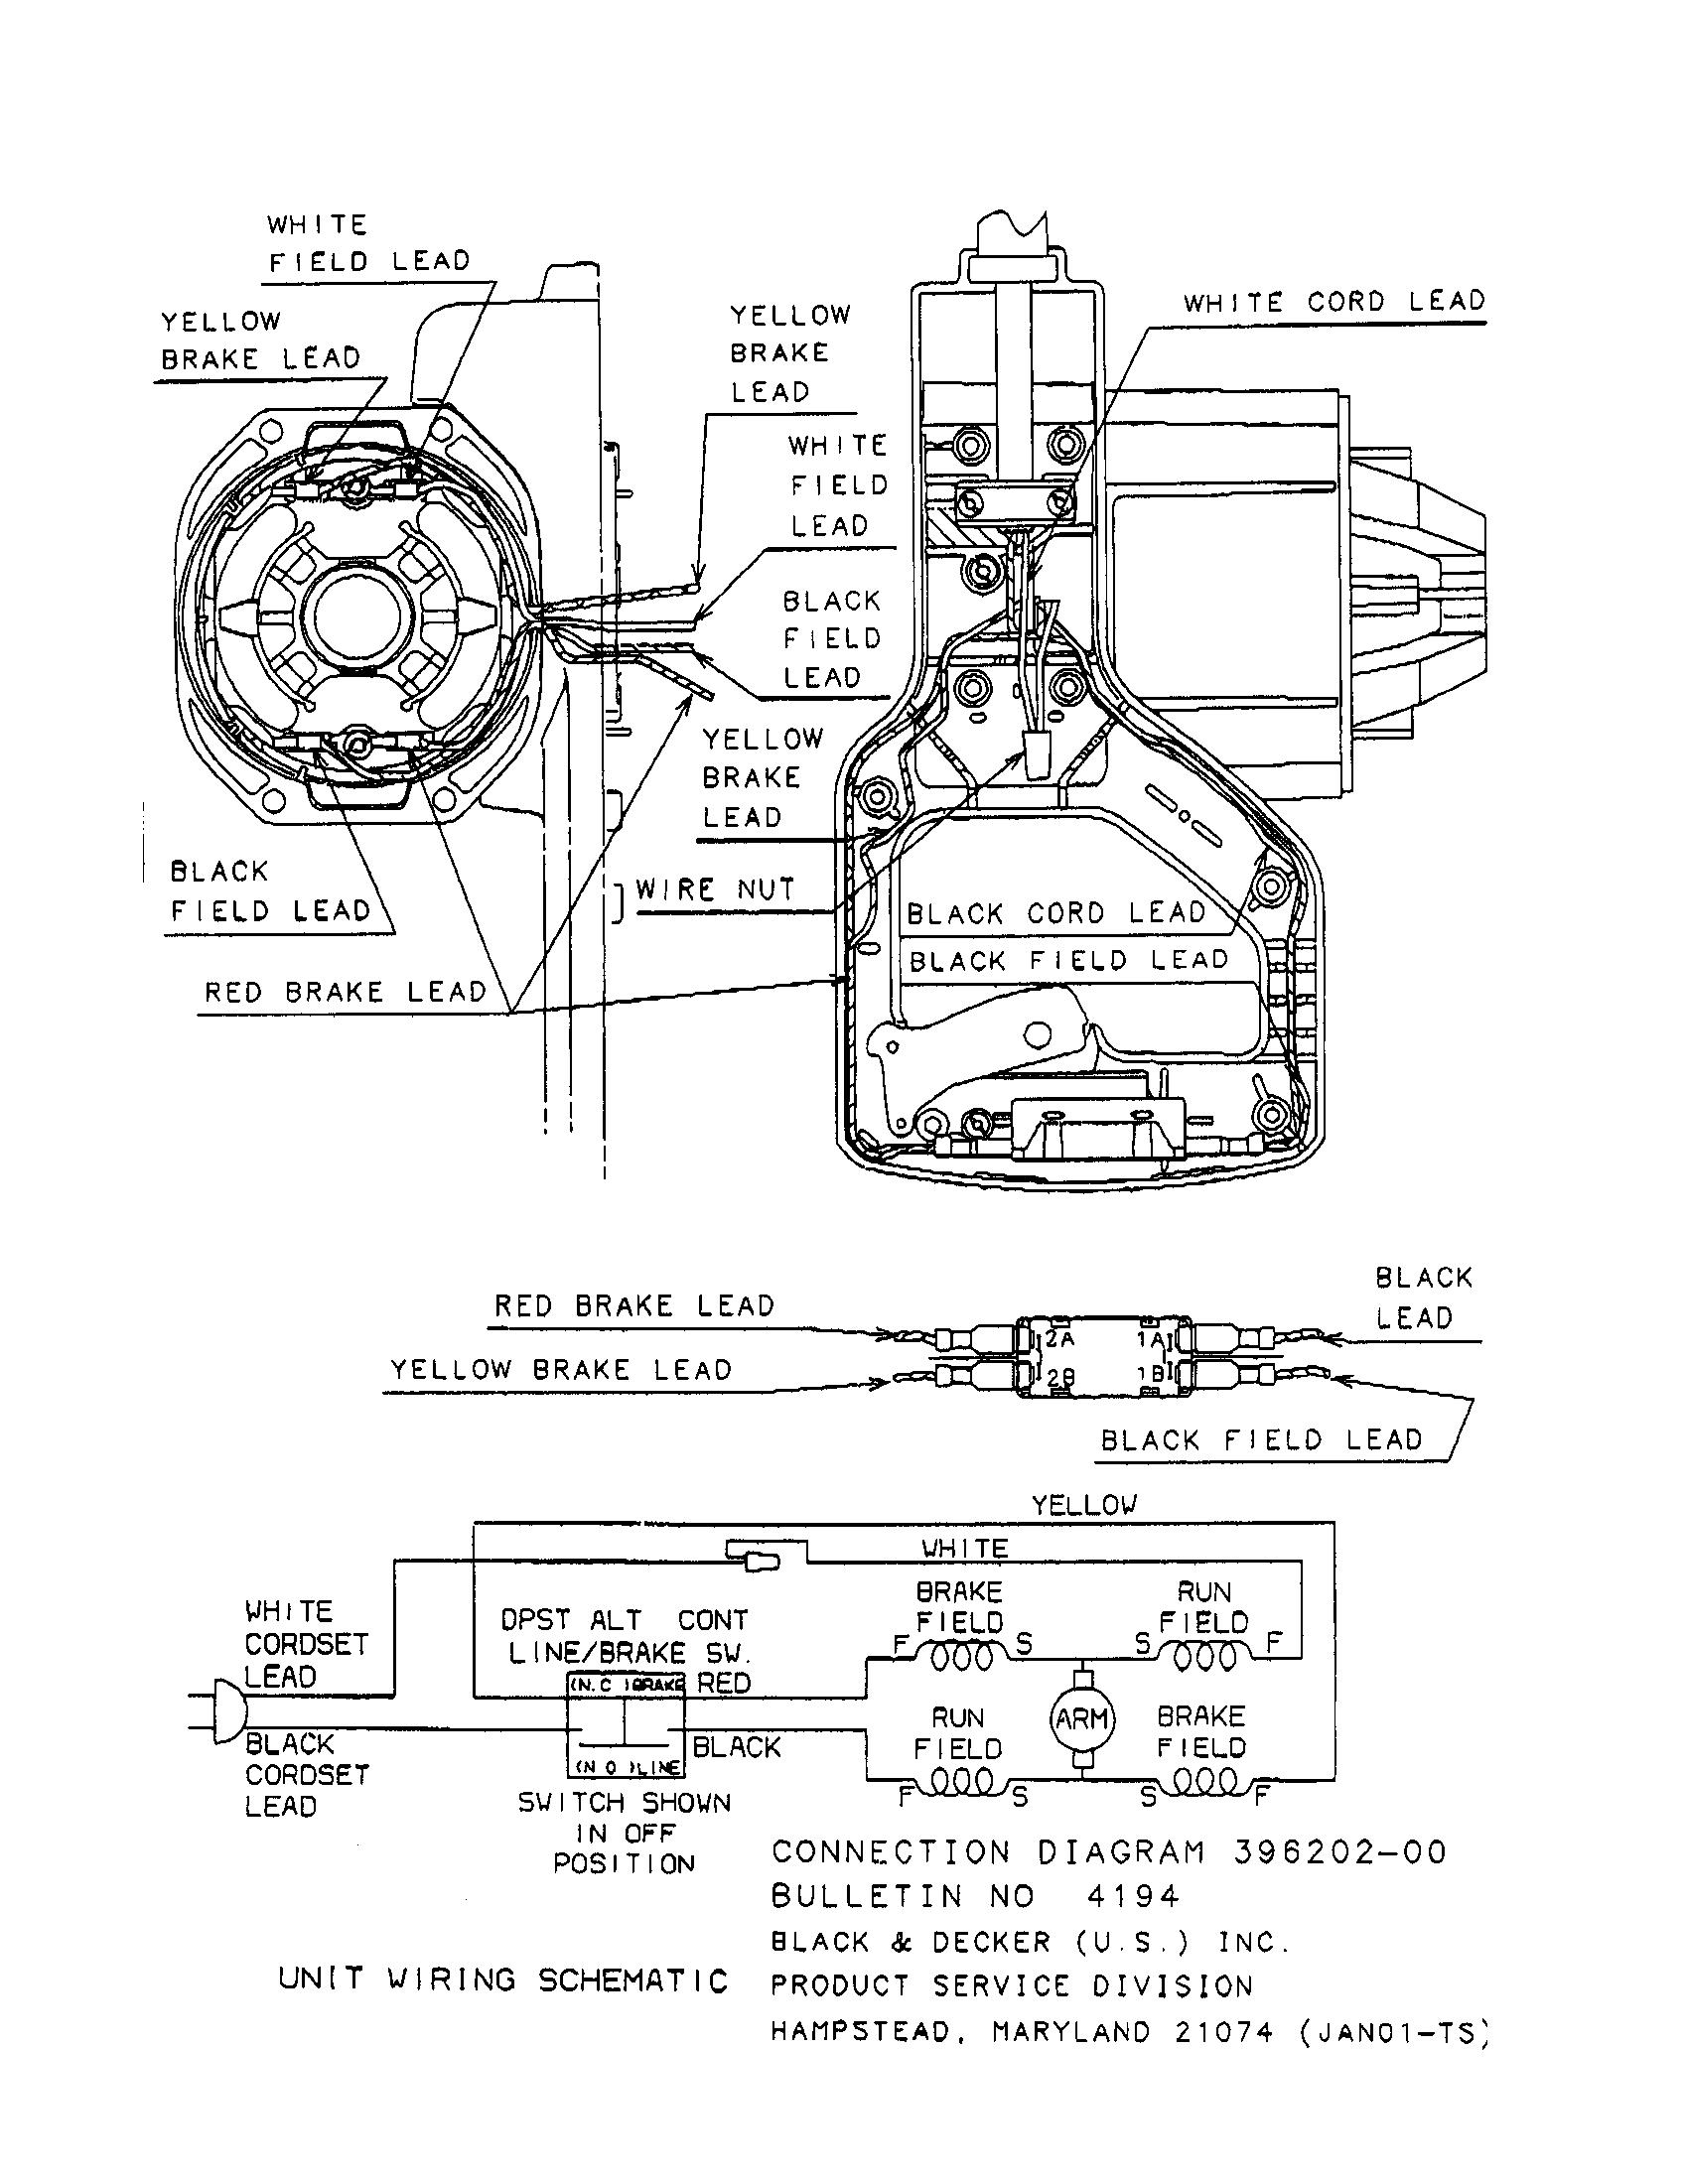 NV_7522] Dw268 De Walt Wiring Diagrams Free Diagram